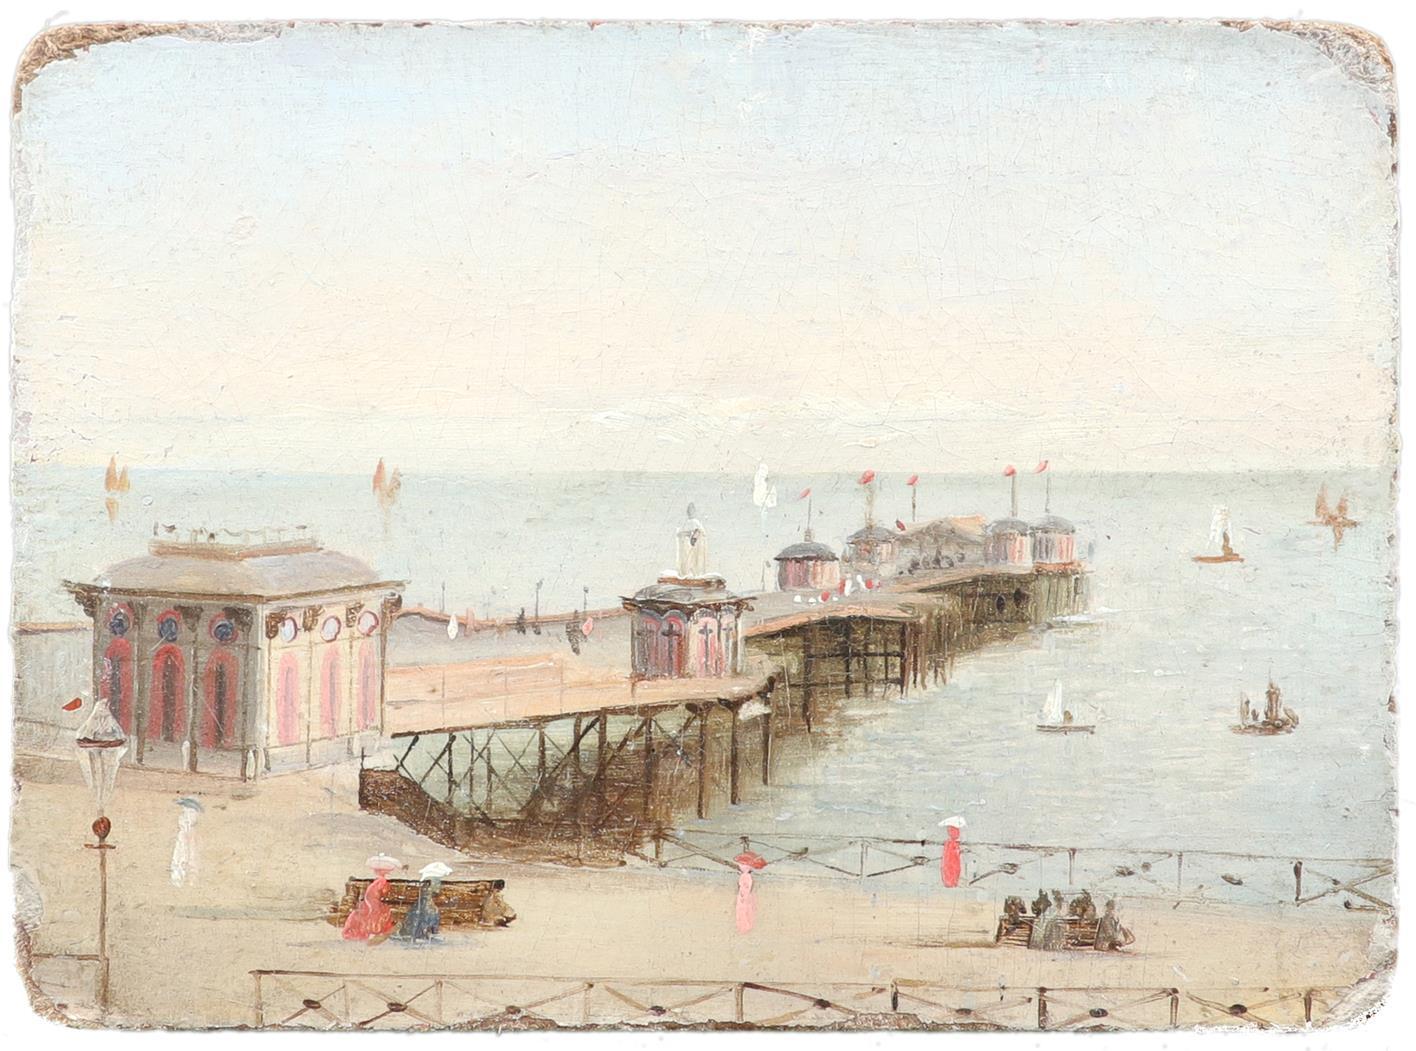 British School c.1900 Elegant figures strolling by the pier Oil on board 8.8 x 12.1cm; 3½ x 4¾in - Image 2 of 3